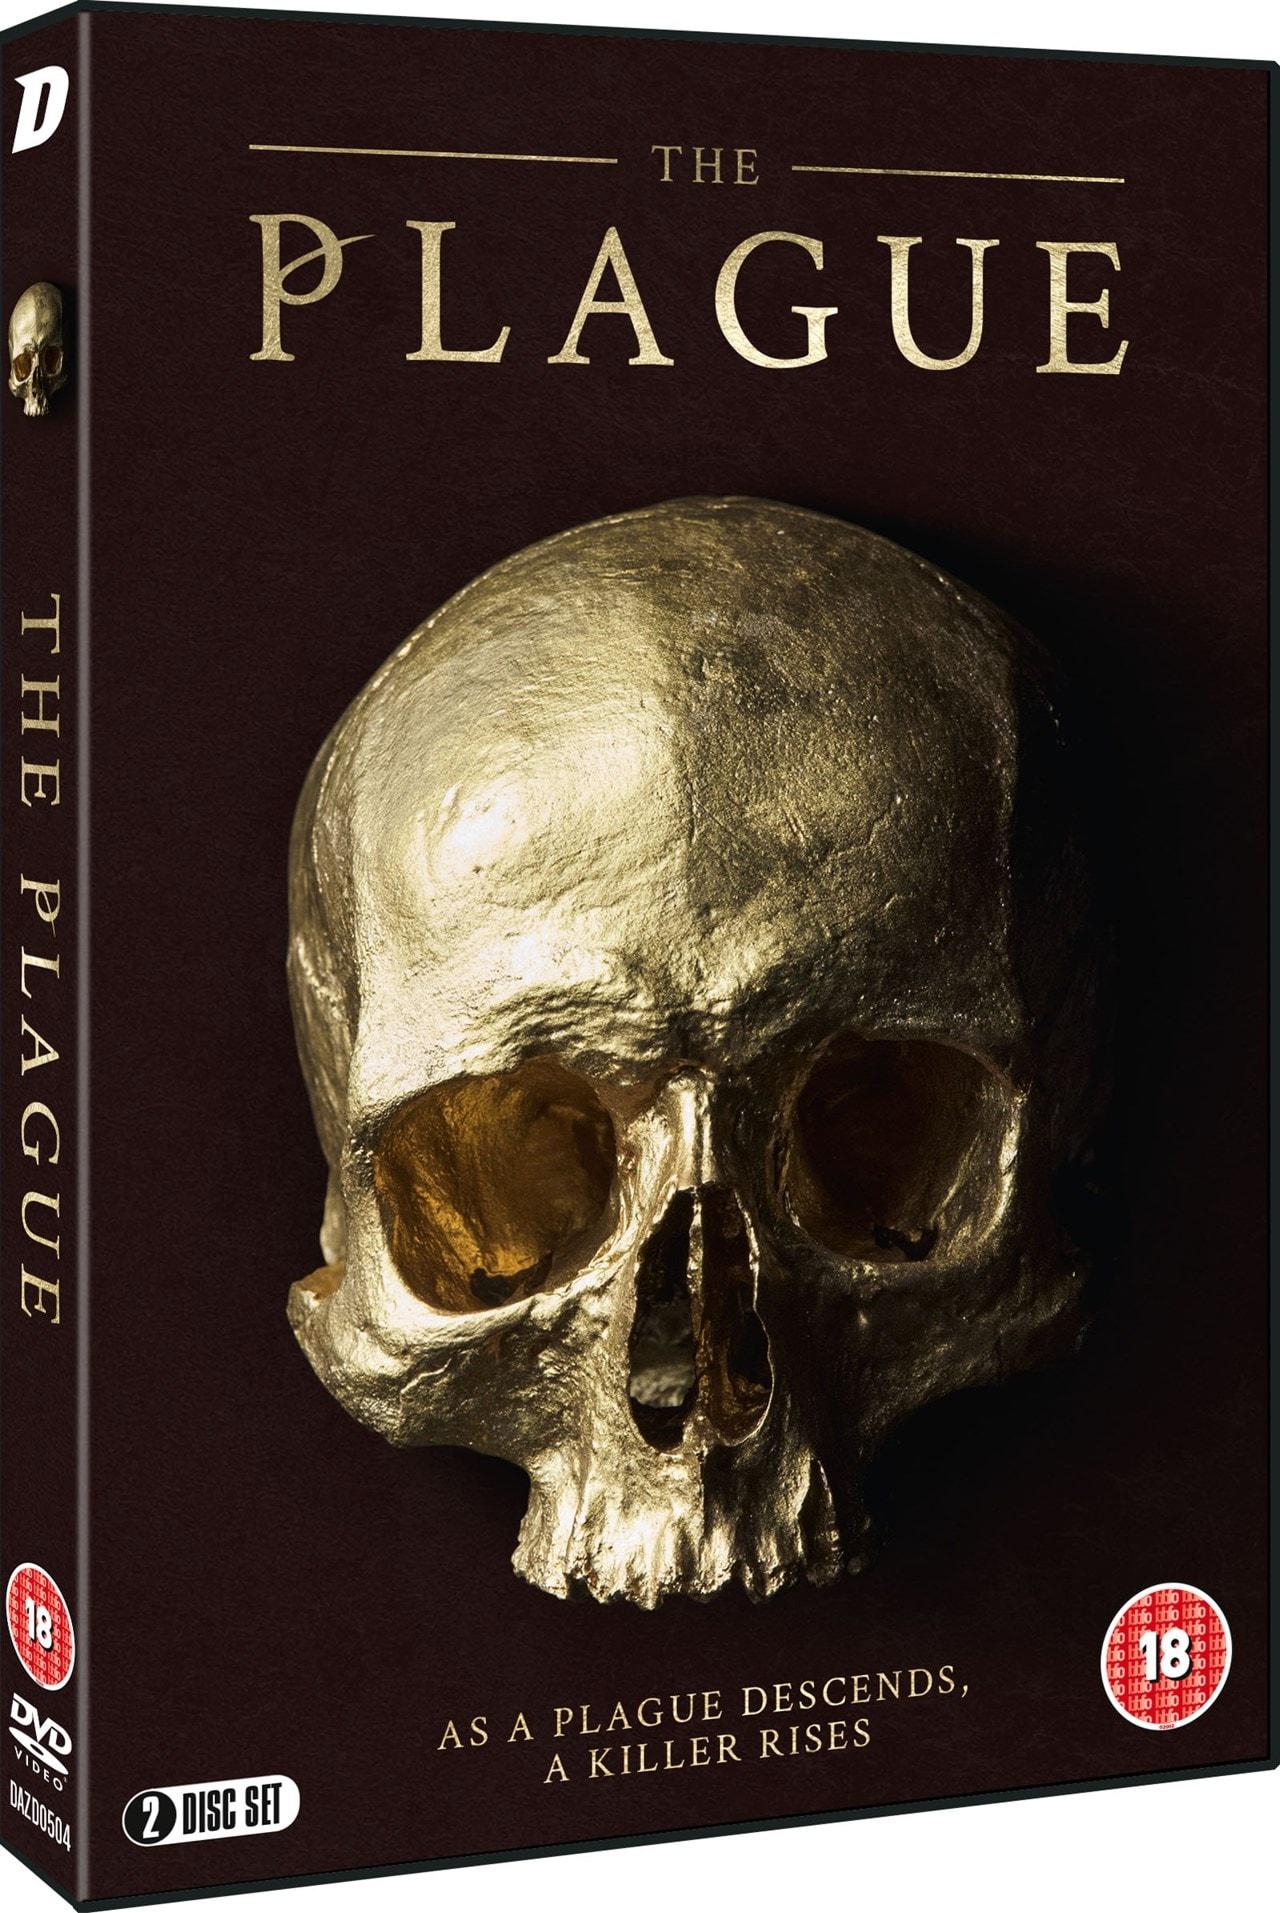 The Plague - 2